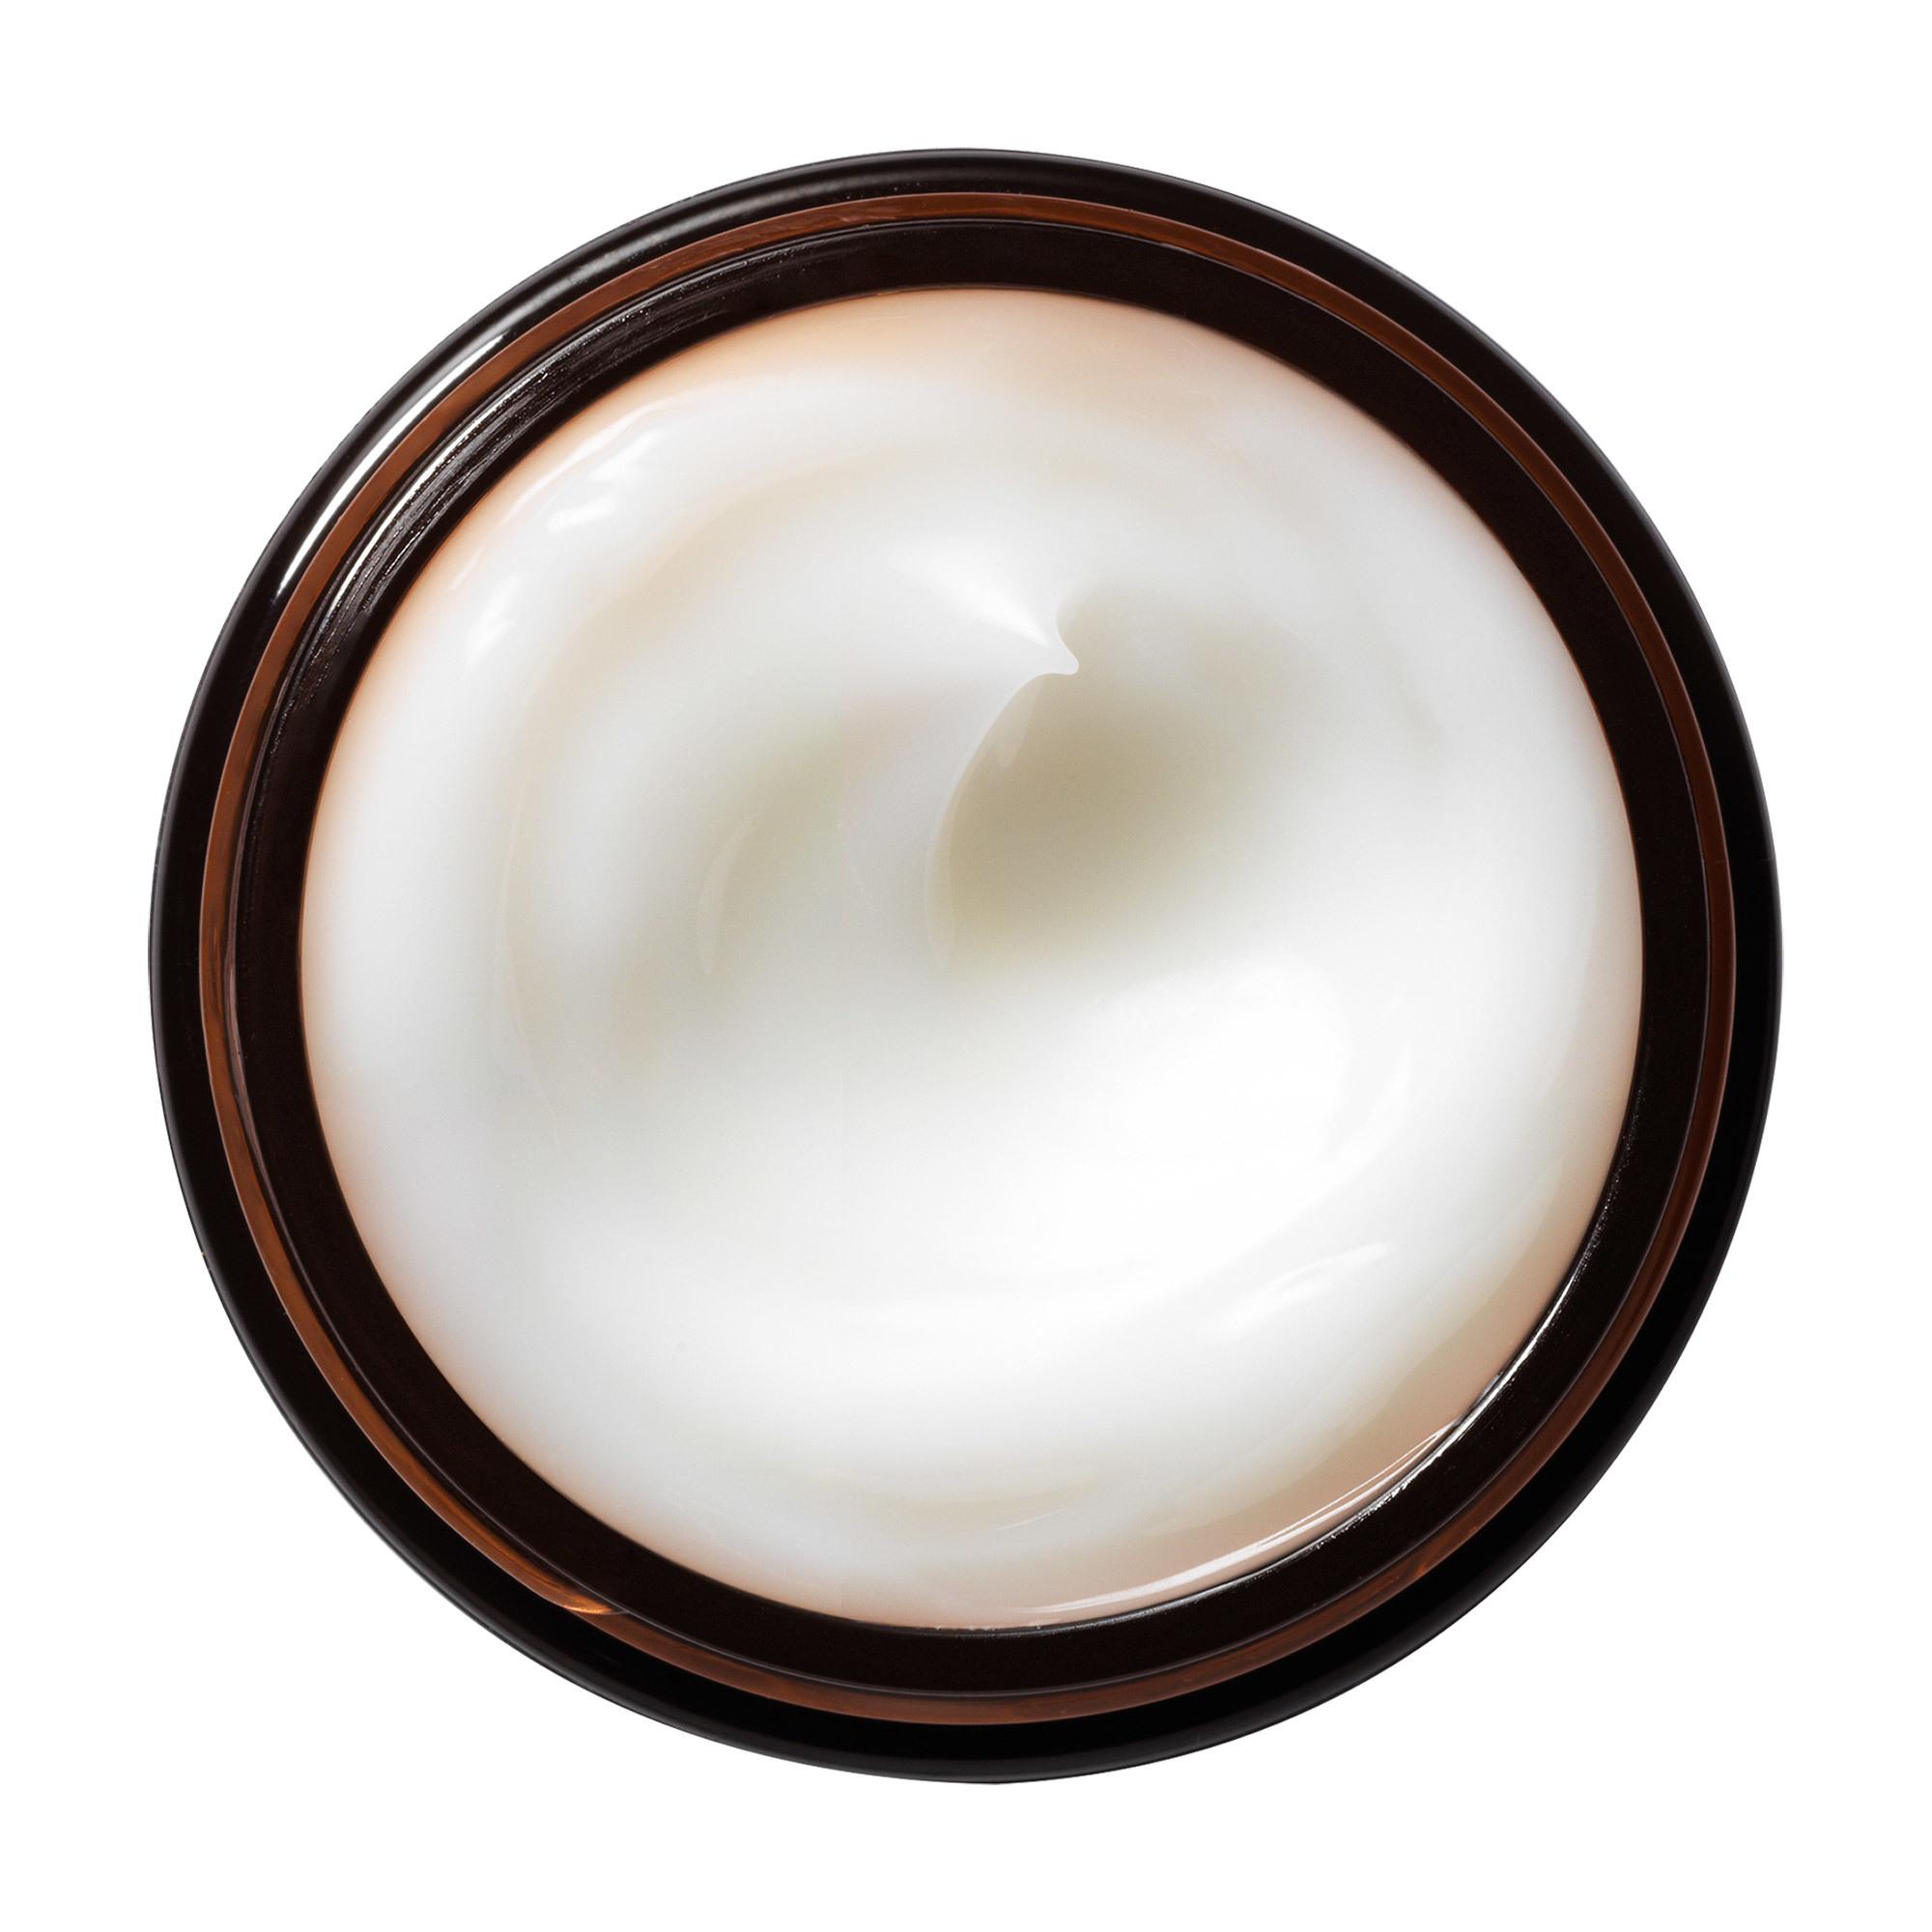 Origins High-Potency Oil-Free Night-A-Mins Resurfacing Cream, 50 ml